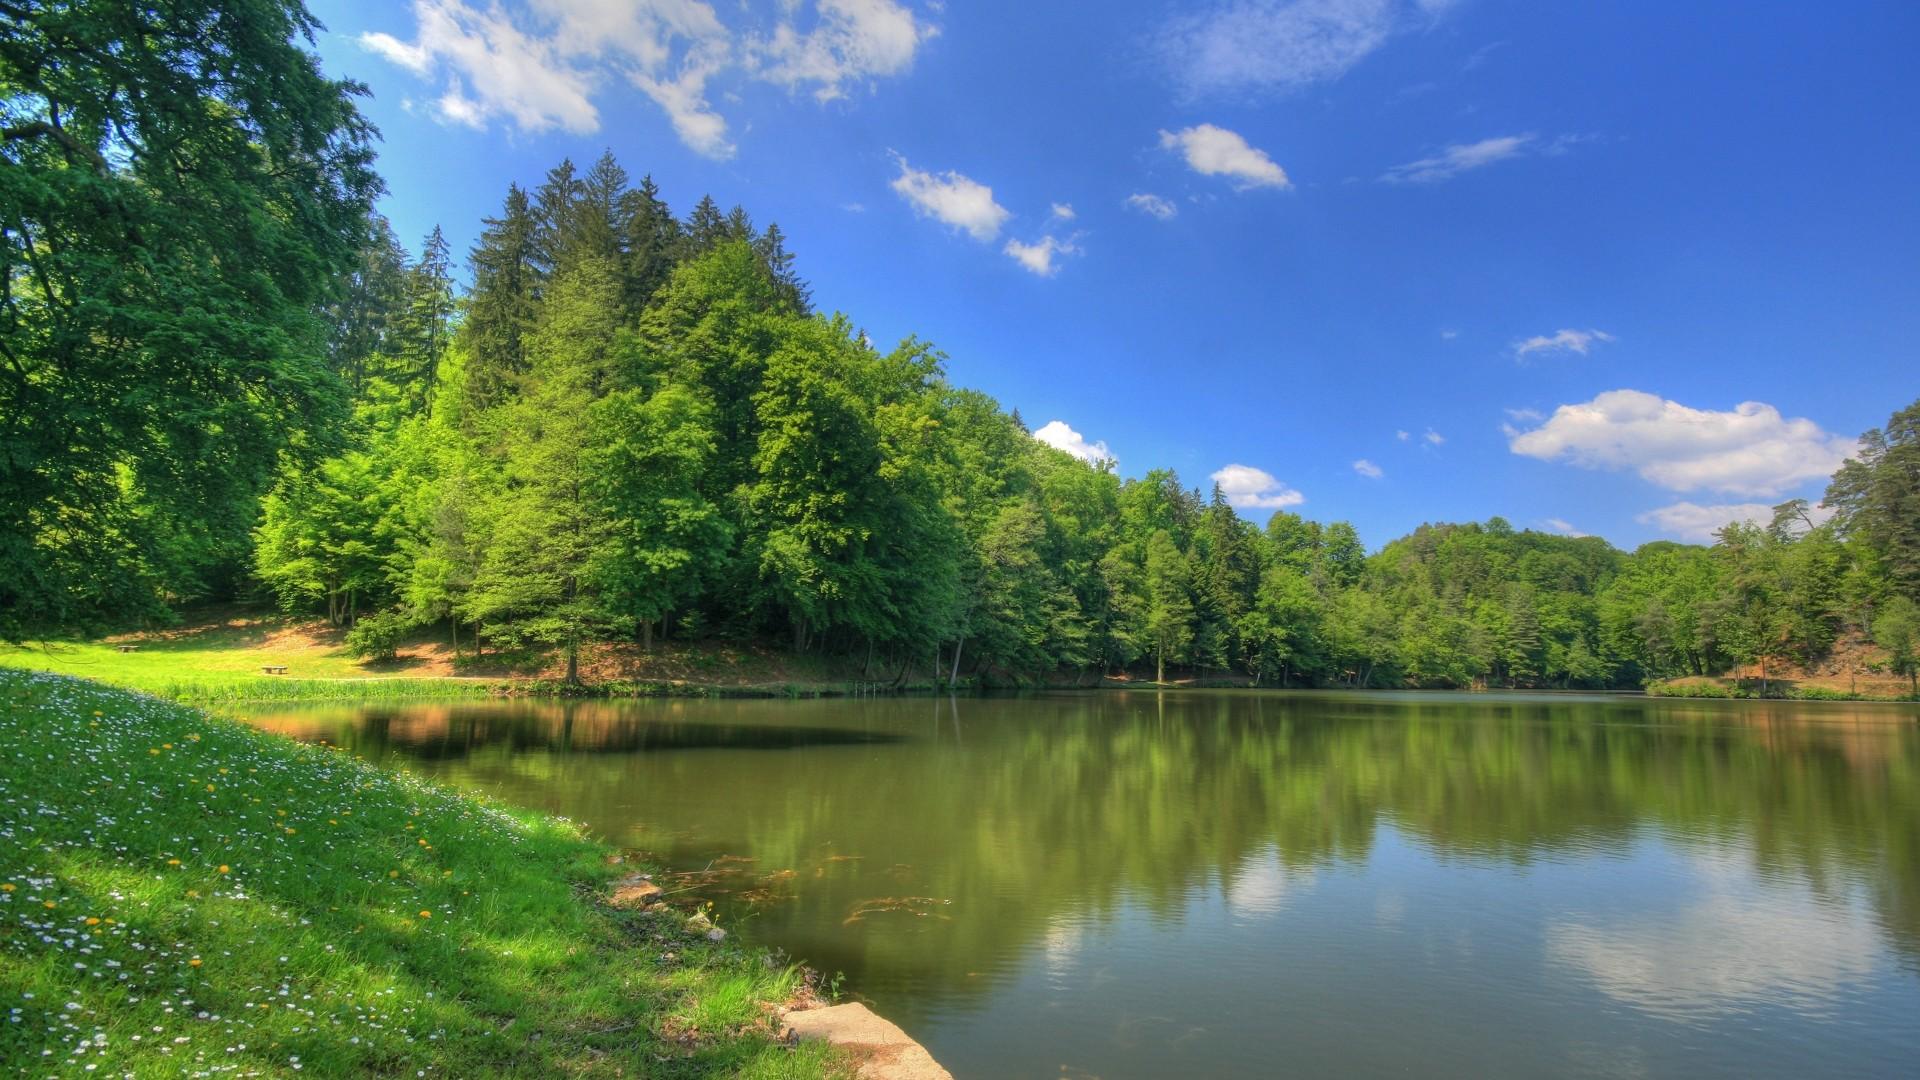 Wallpapers Scenery Hd Water Tree Nature | #1805328 #scenery